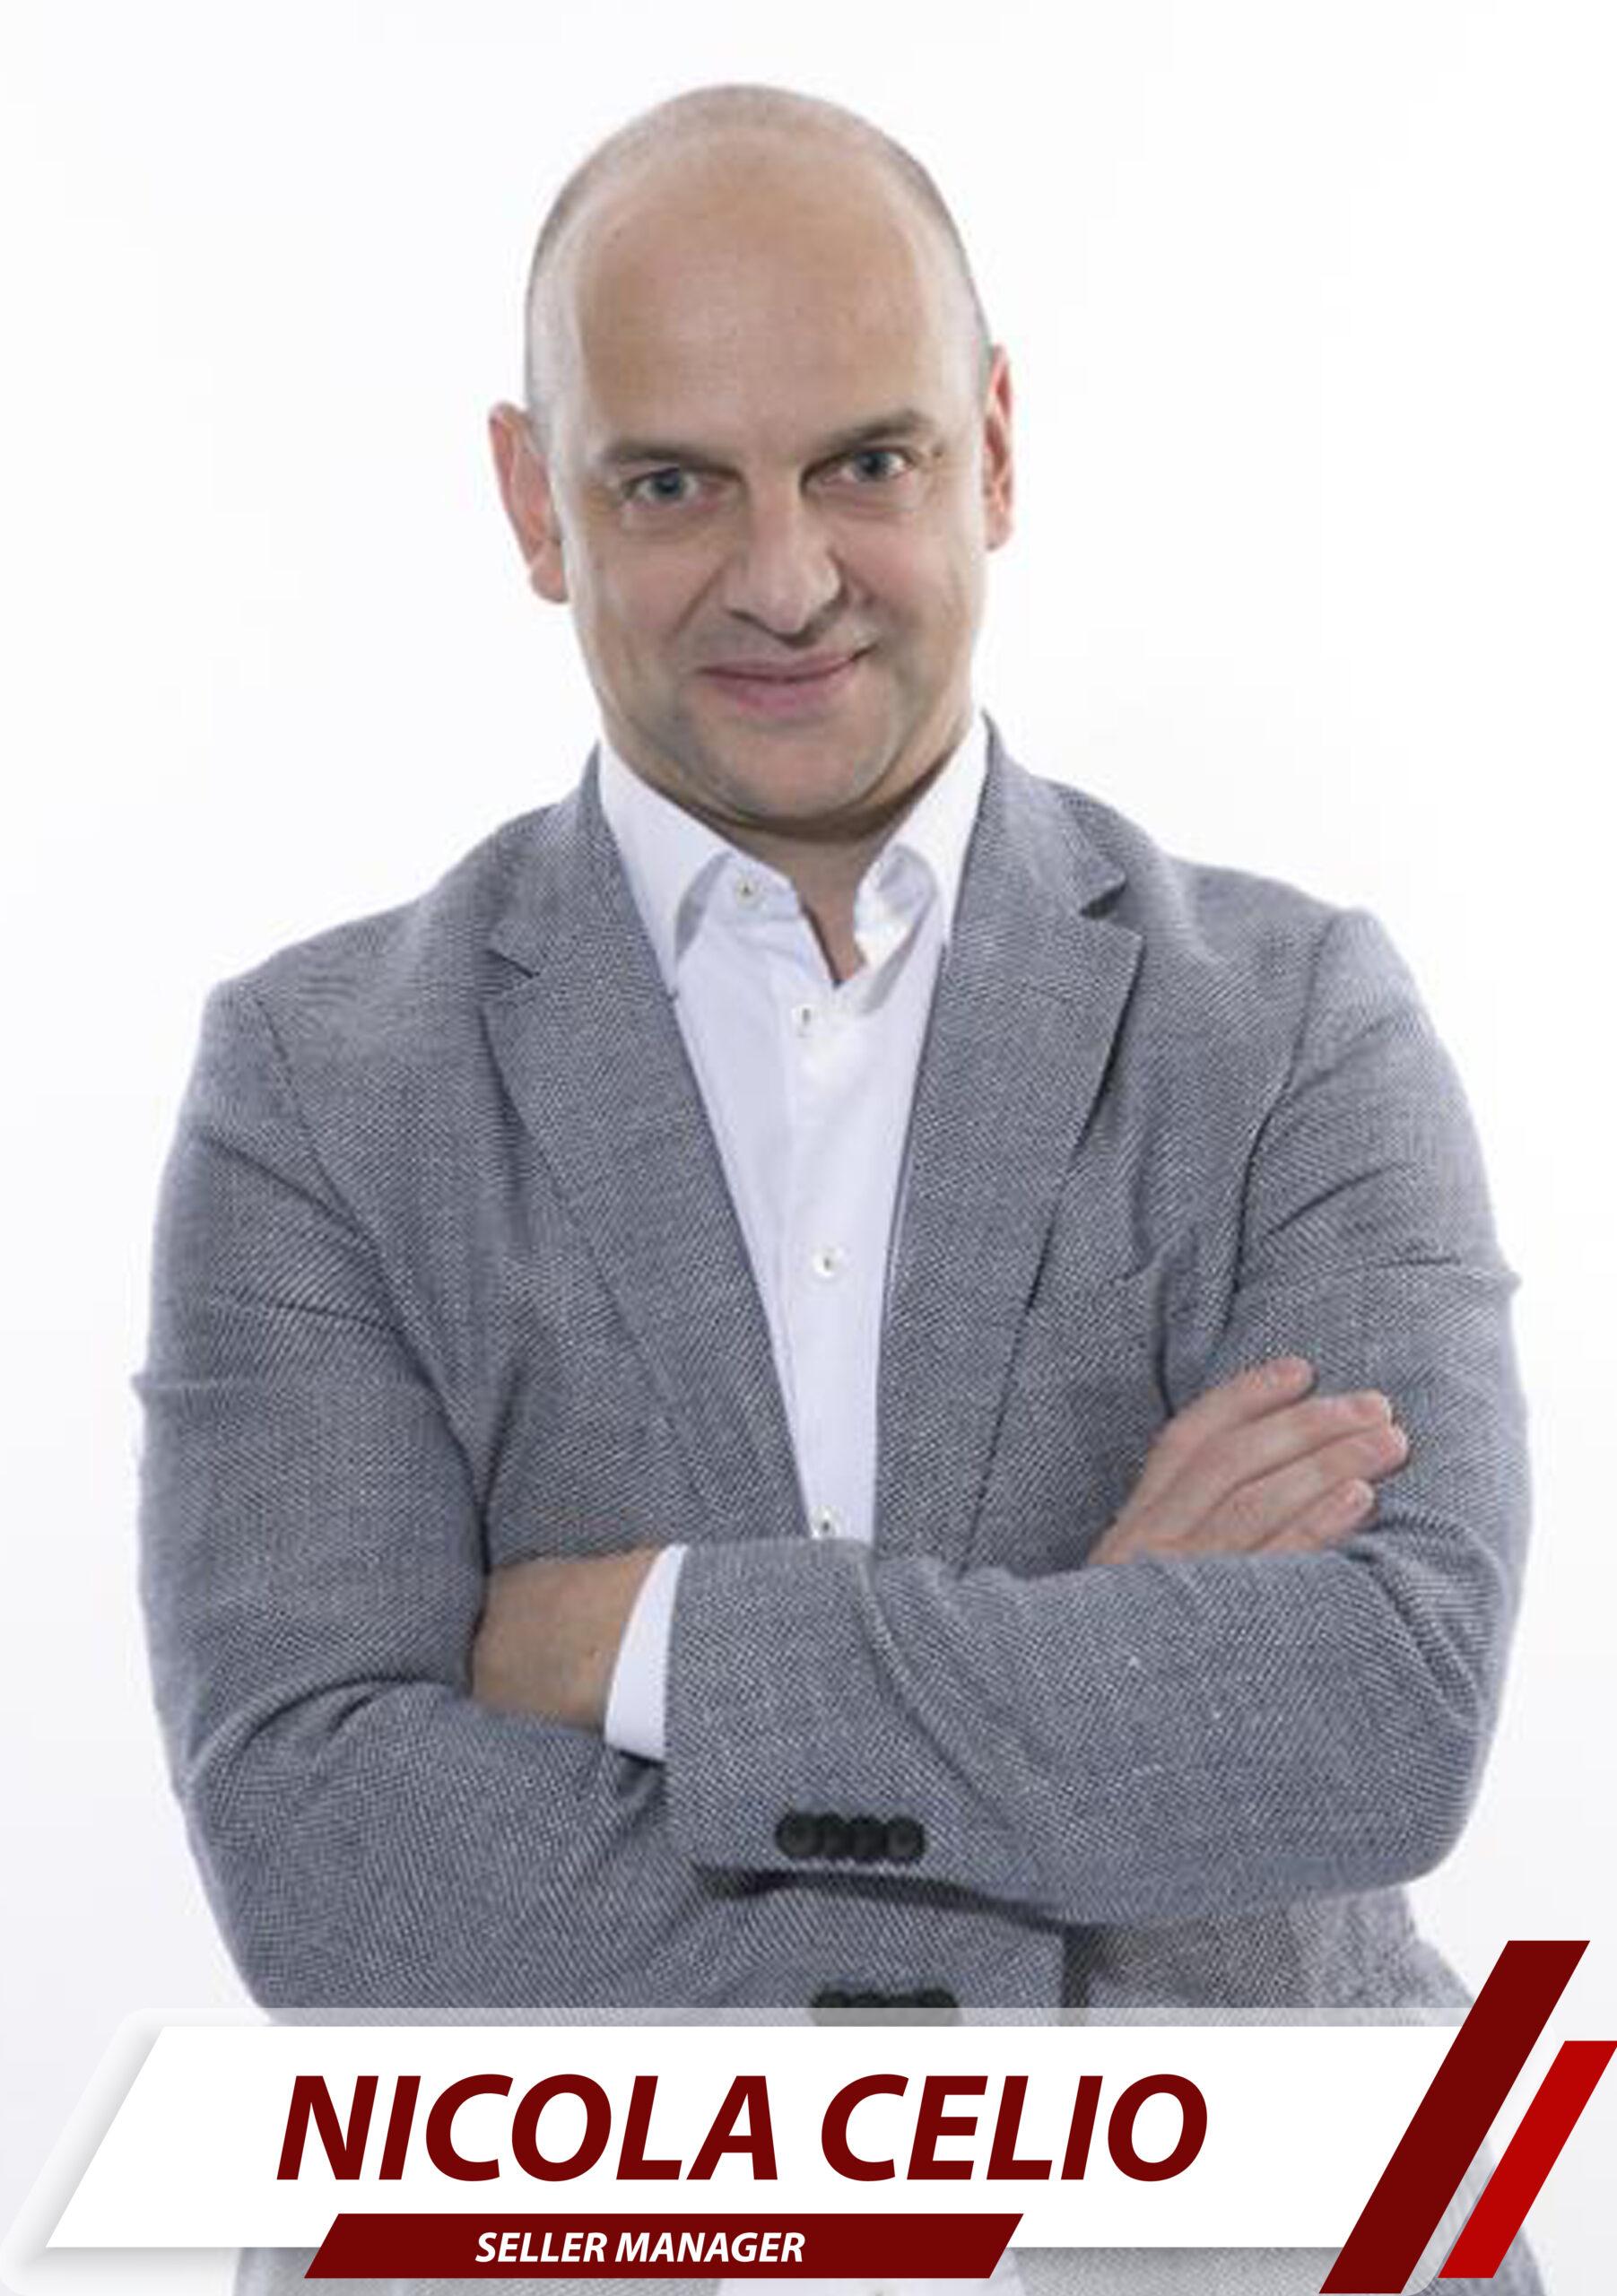 Nicola Celio - Seller manager